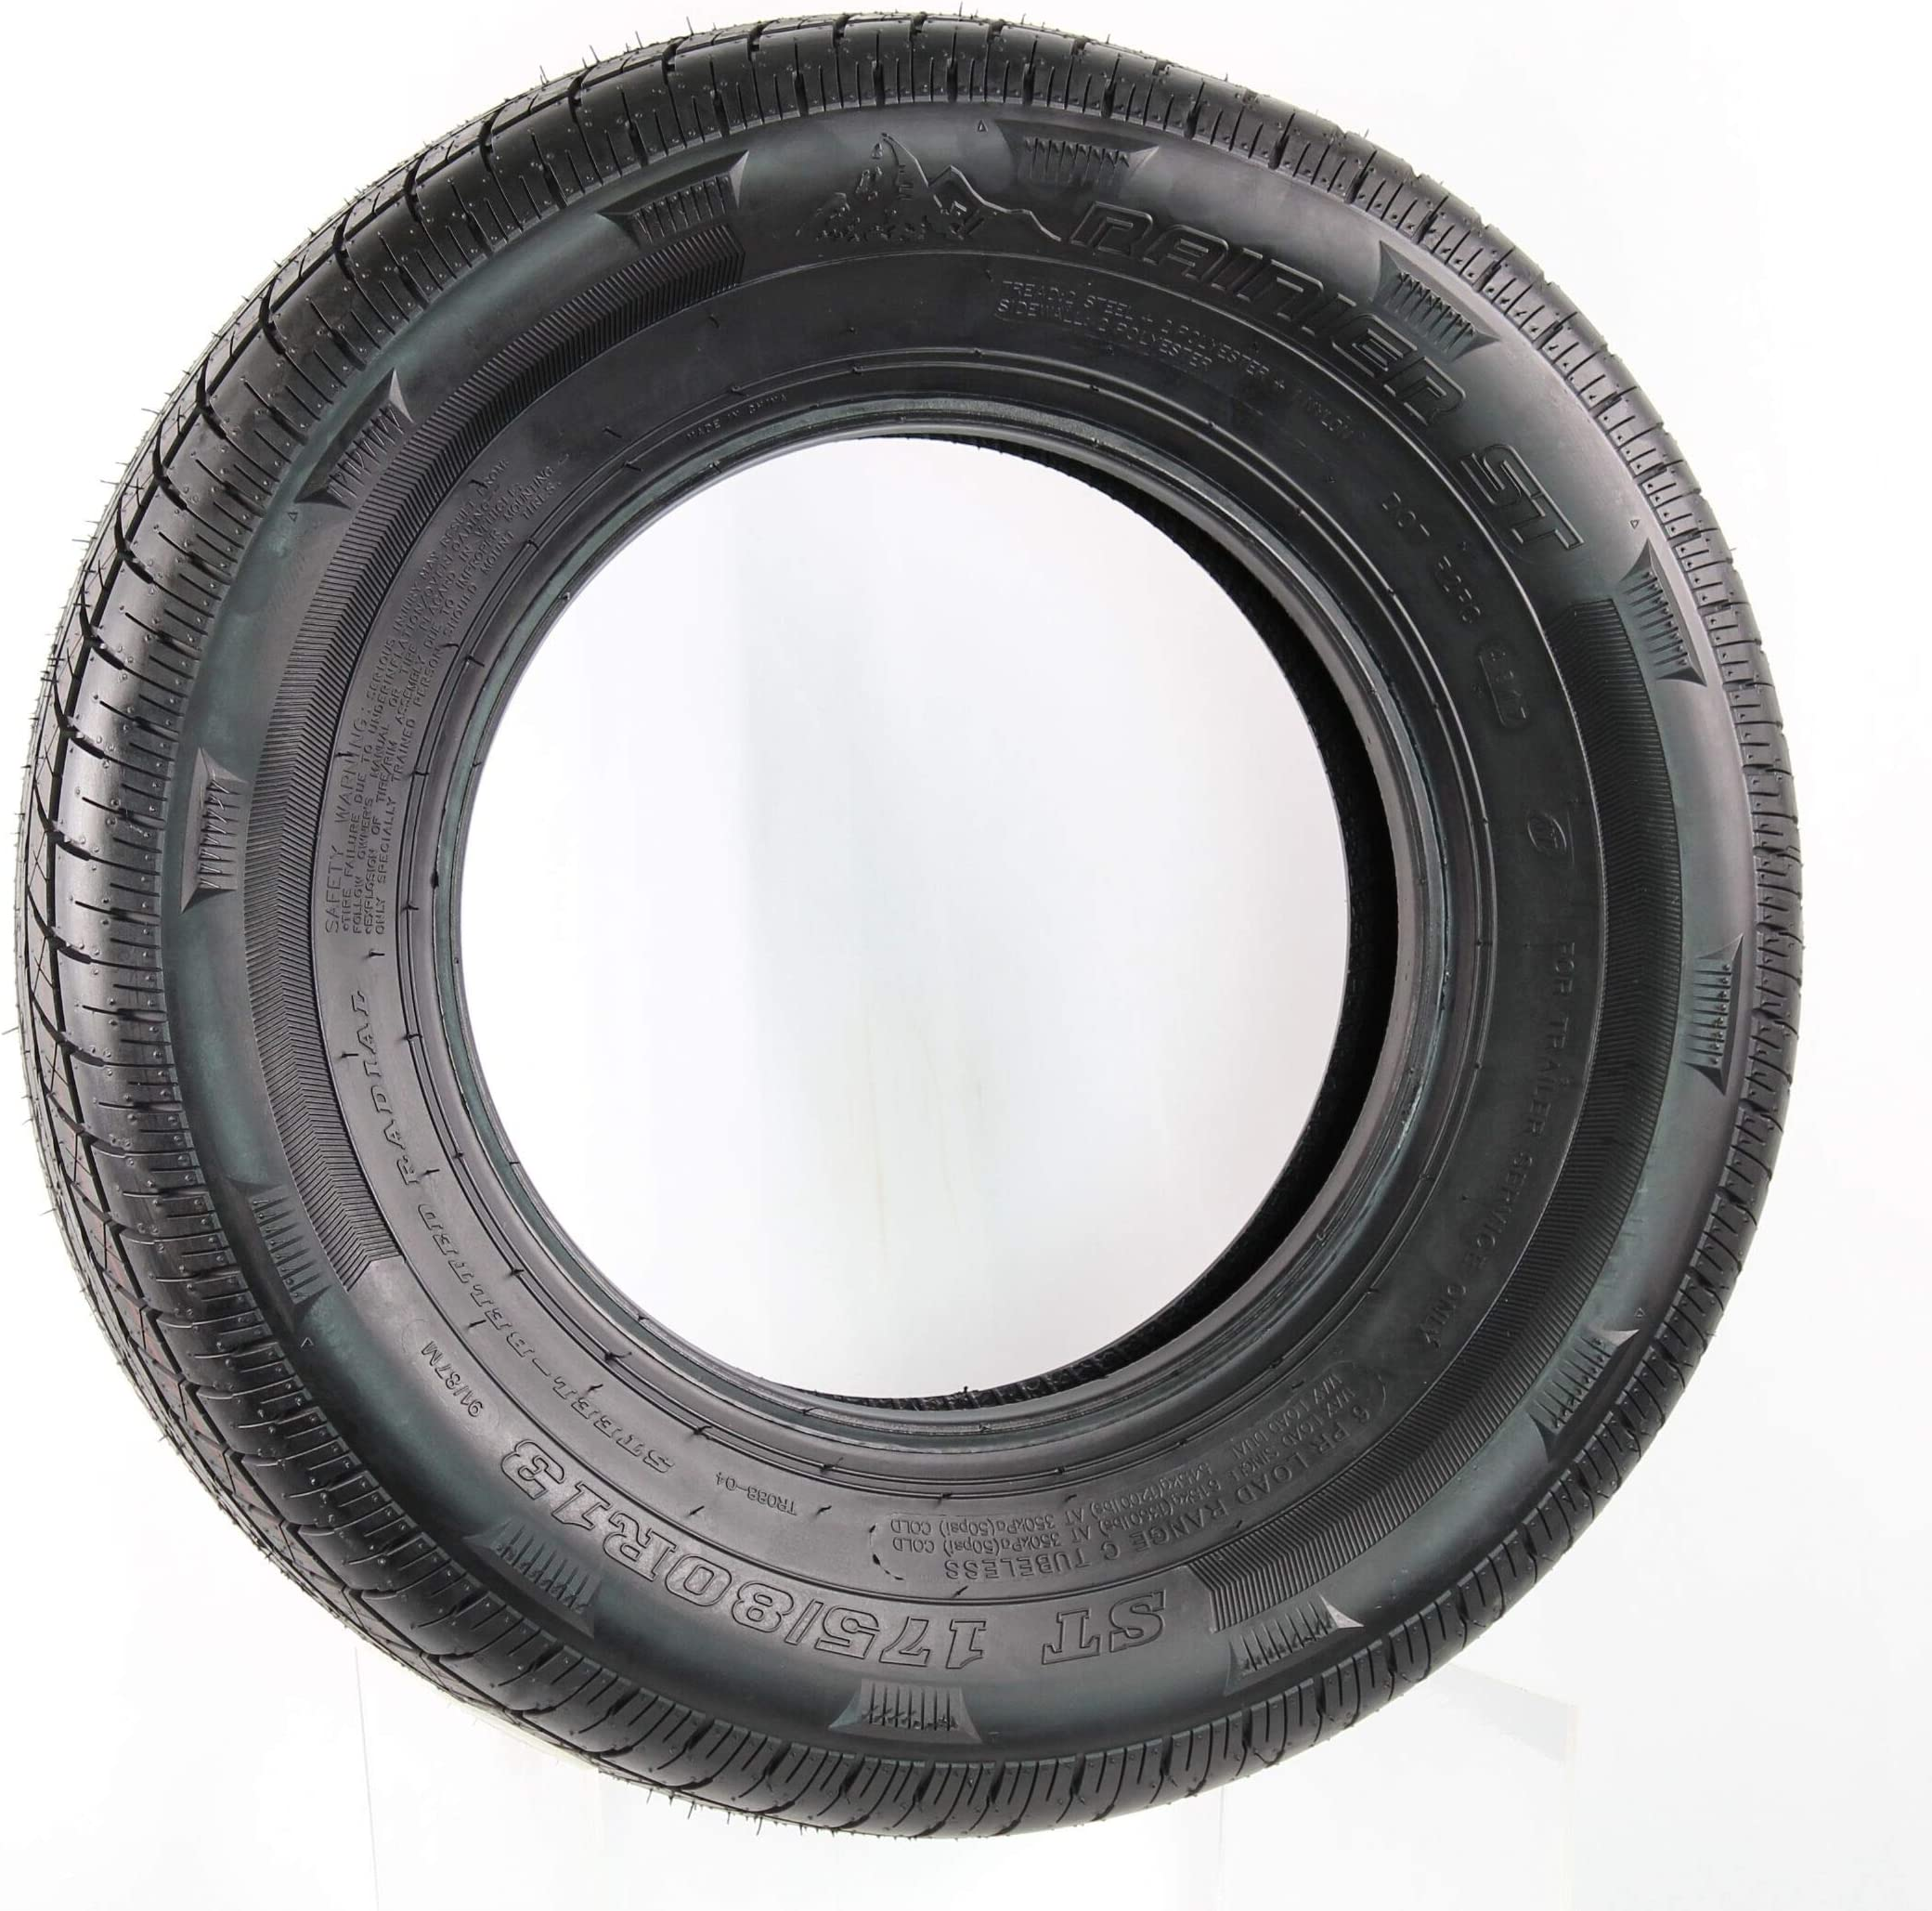 2-Pack eCustomrim Rainier Radial Trailer Tire ST215//75R14 LRC 1870 Lb 50 PSI